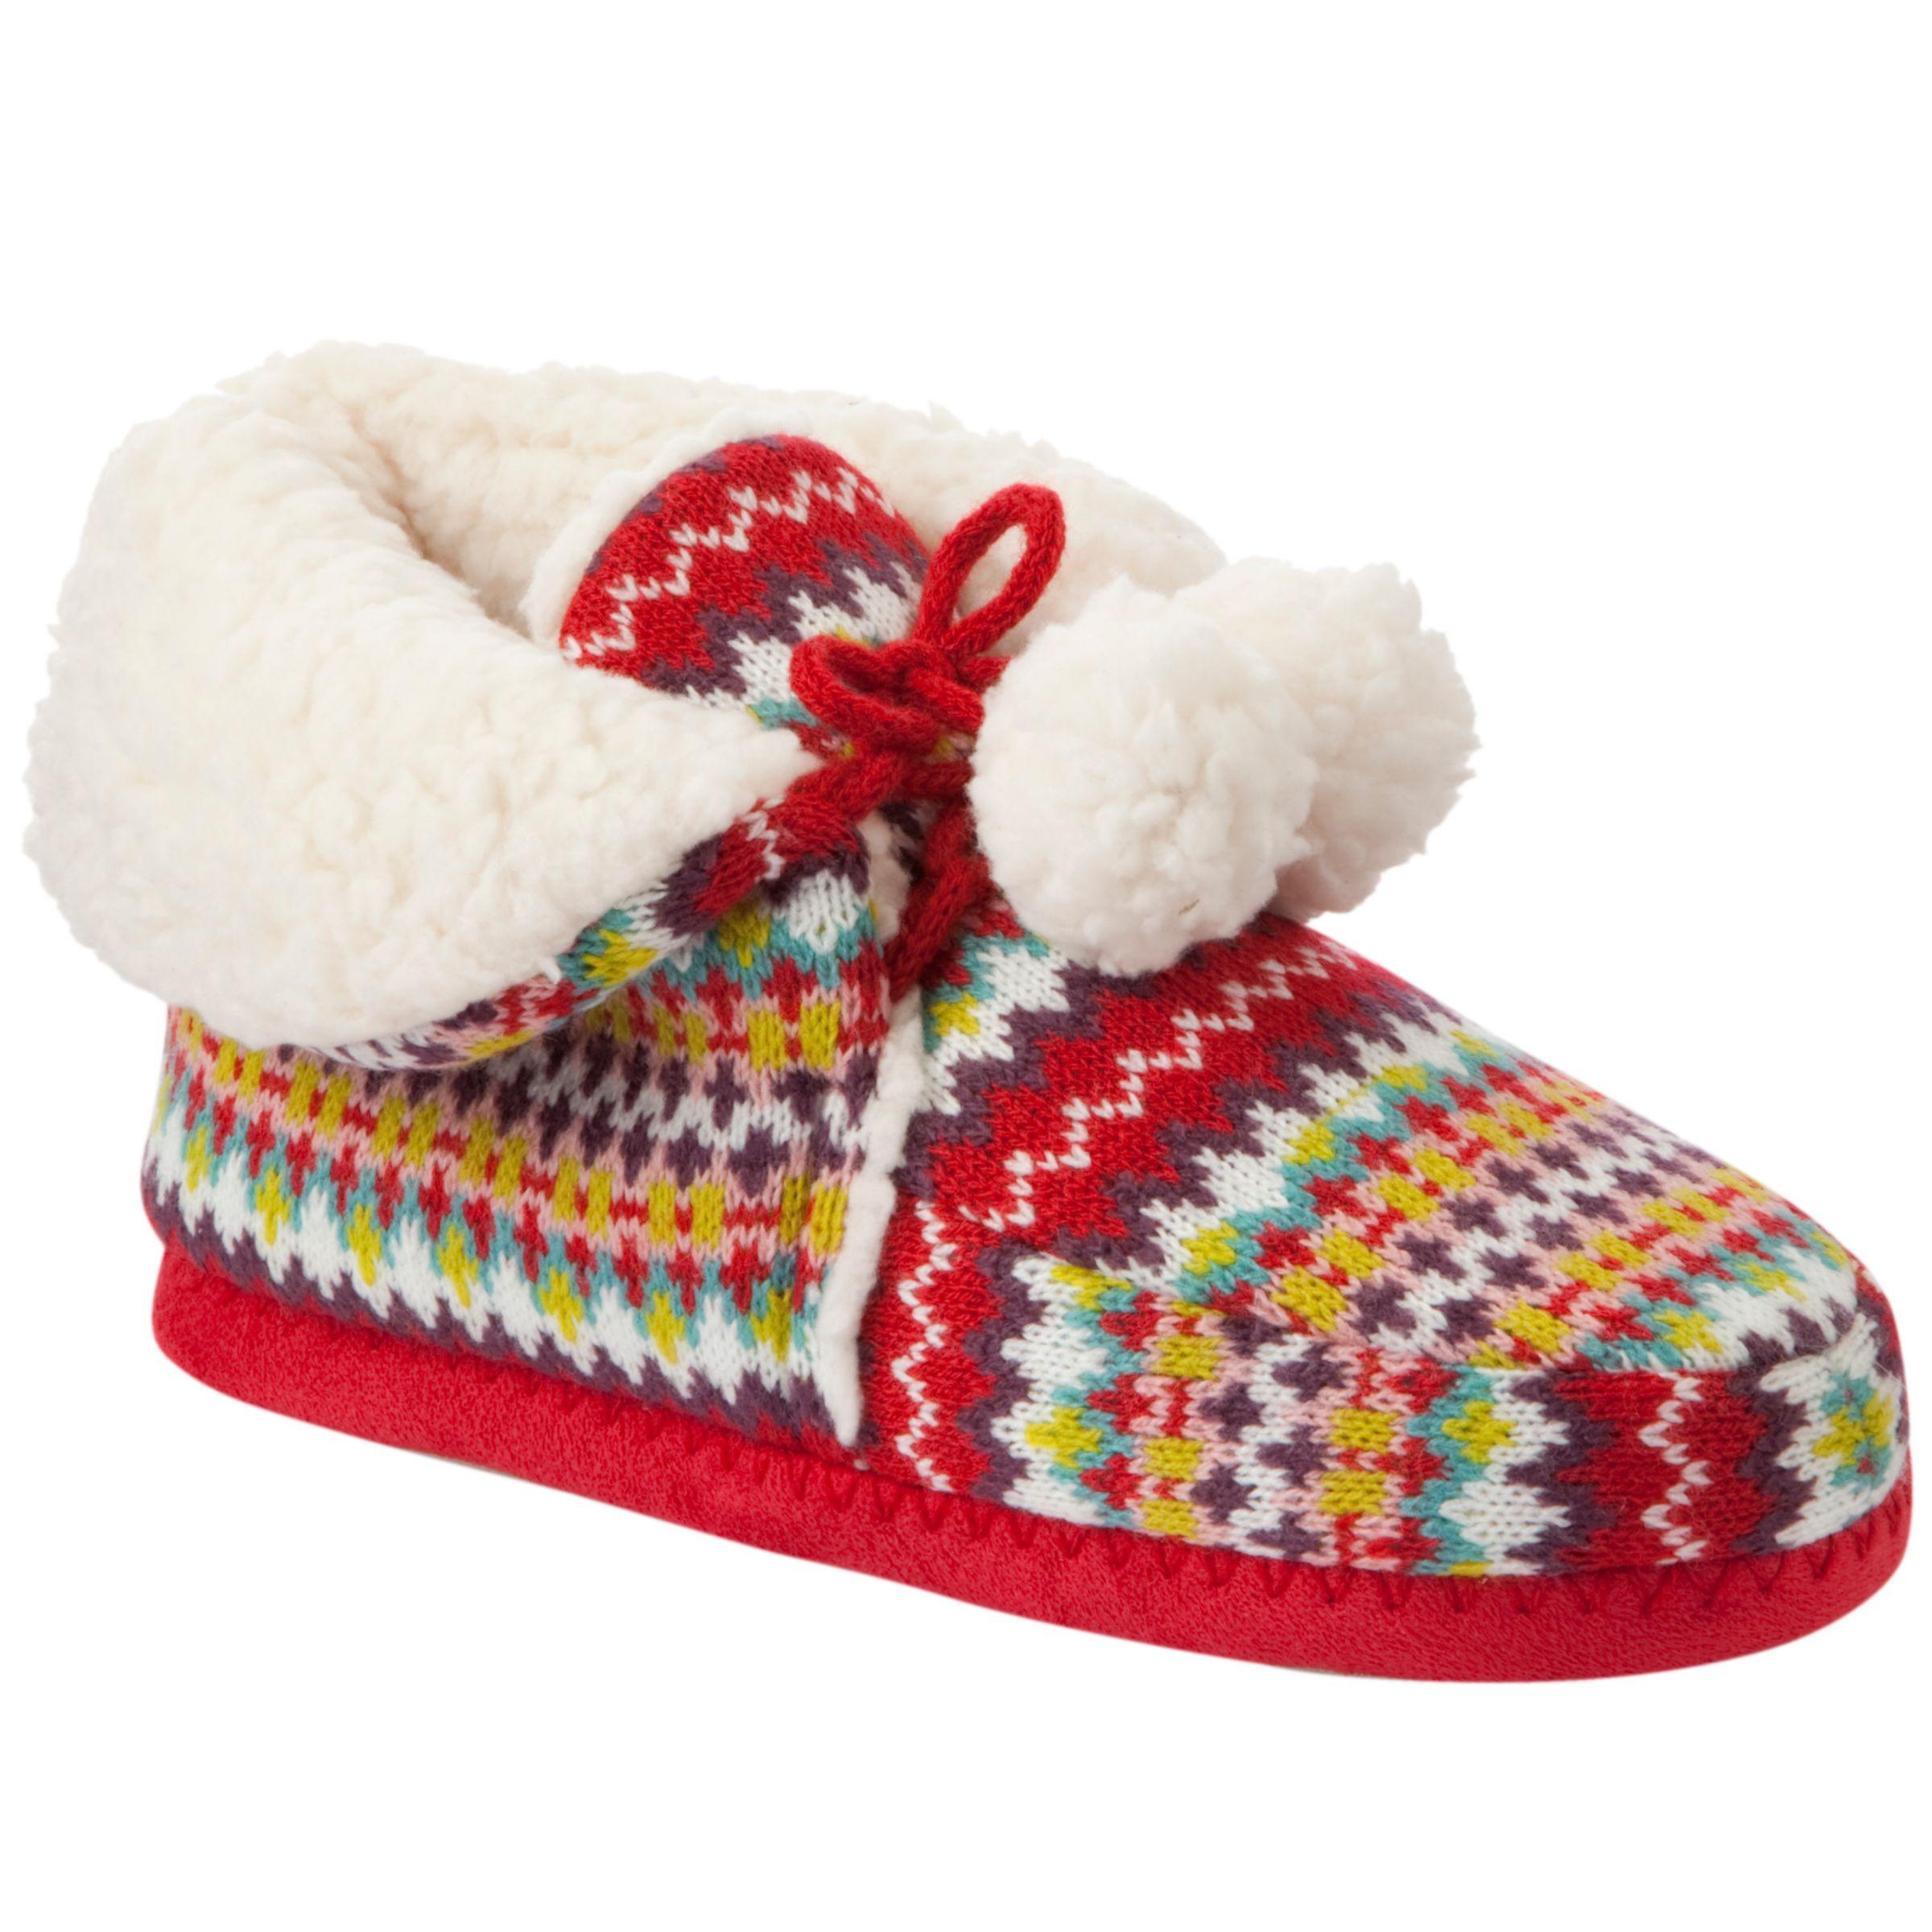 John Lewis Girl Fair Isle Knitted Slippers, Red/Multi